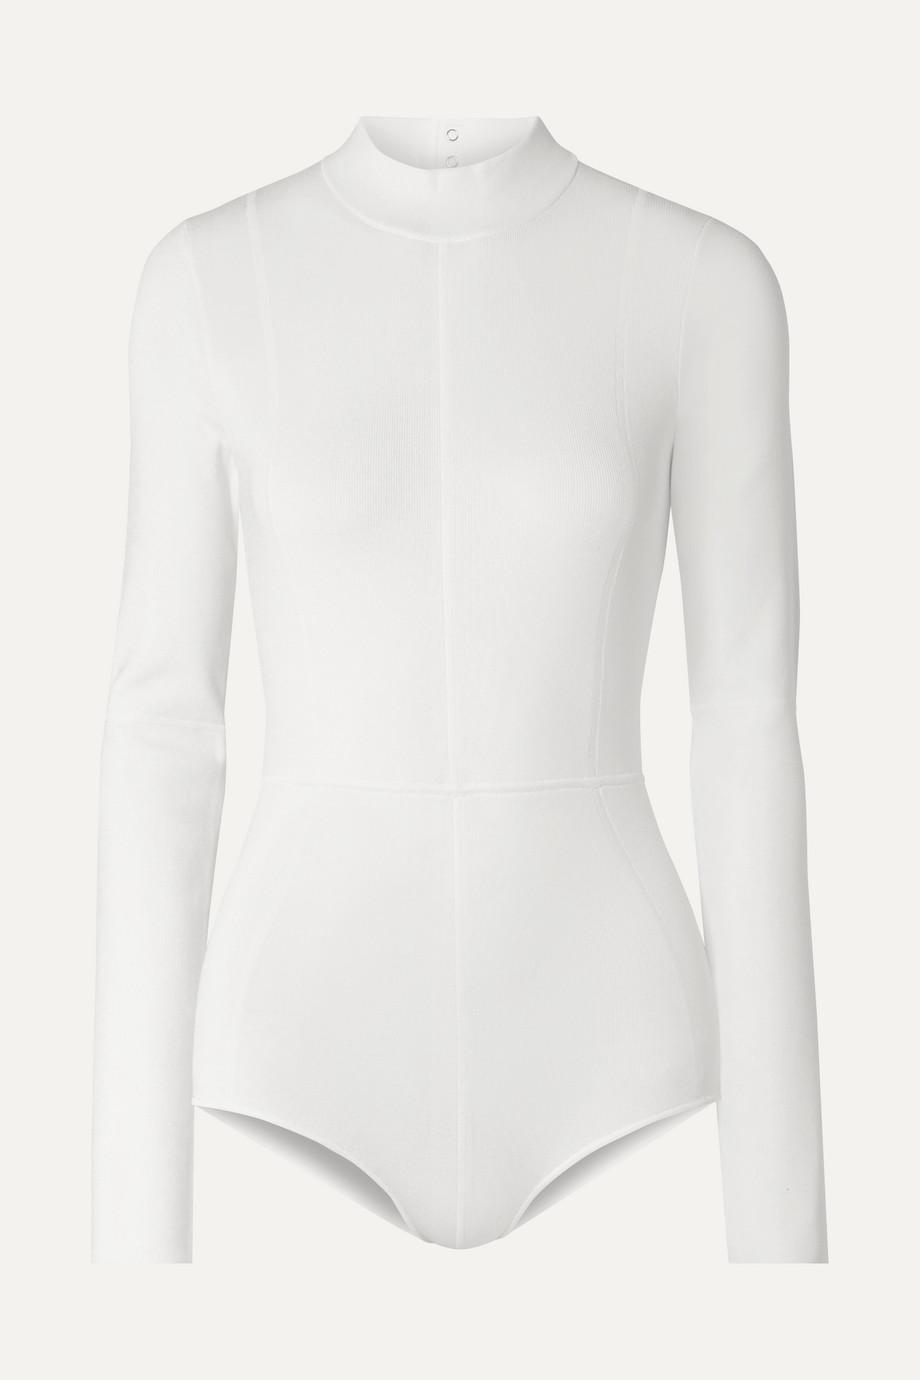 Helmut Lang Cutout stretch-jersey bodysuit